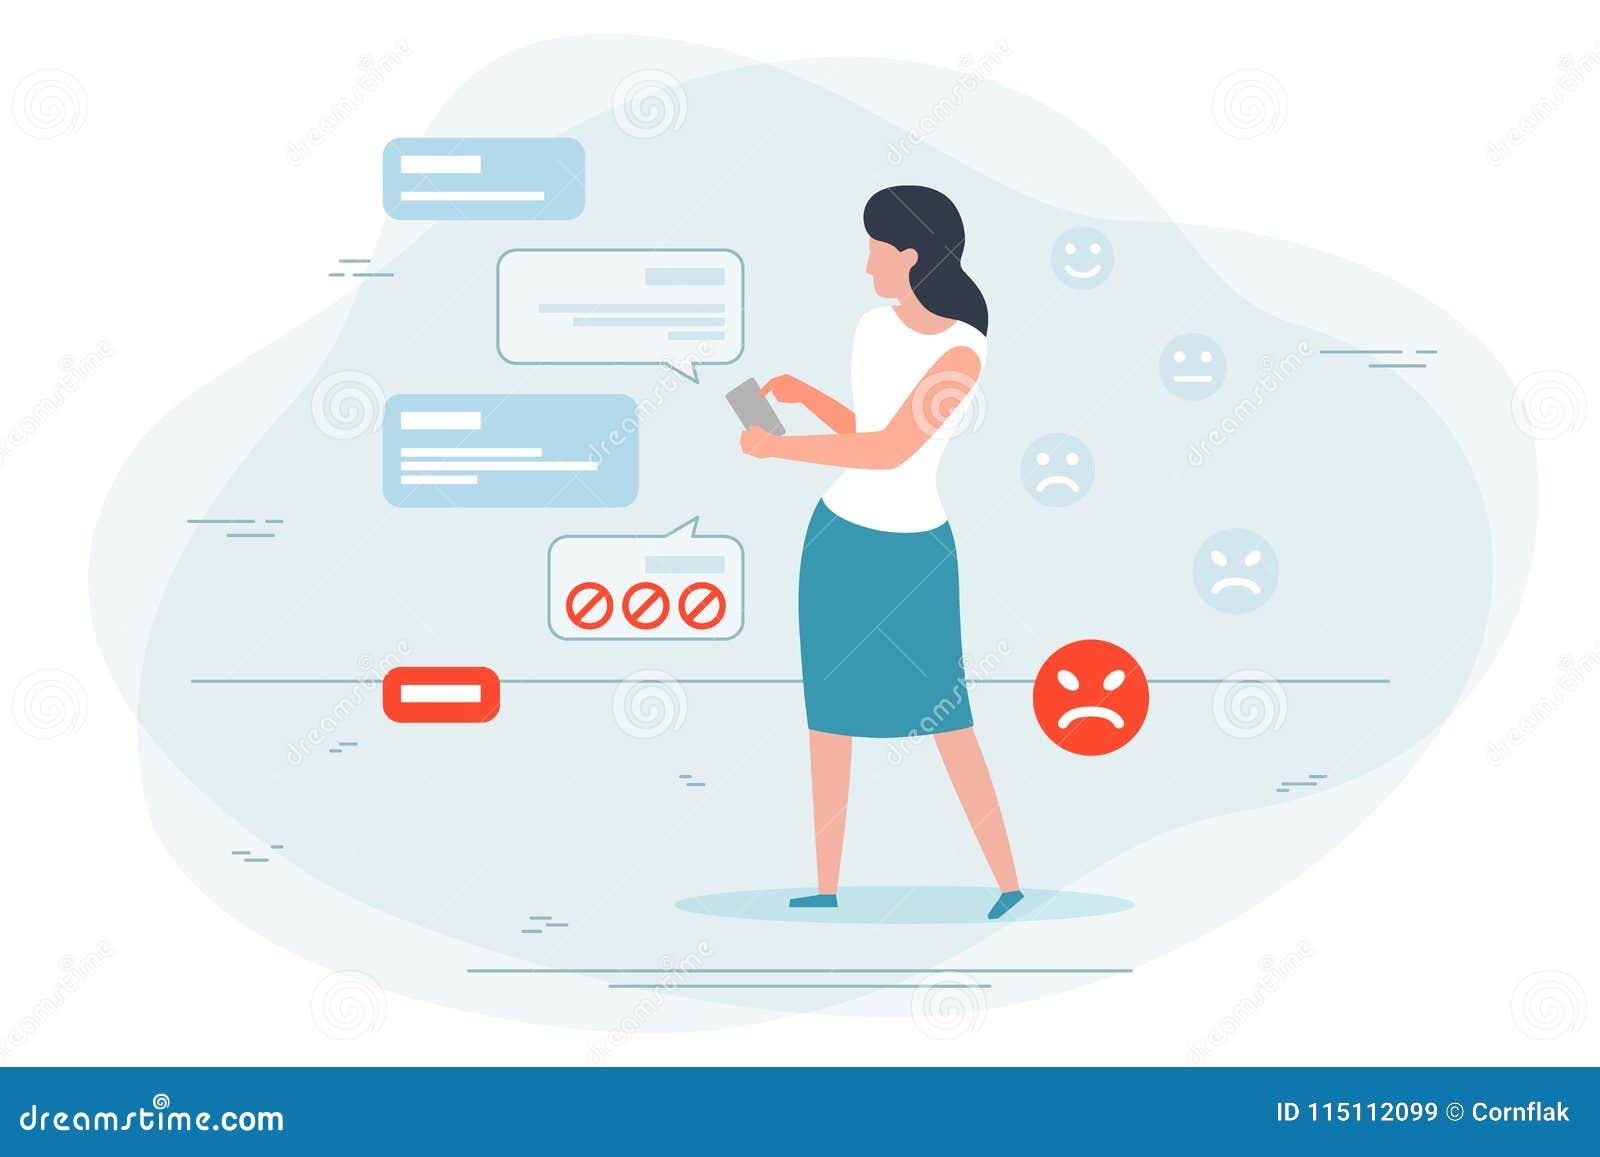 Erste E-Mail an ein Mädchen online datiert